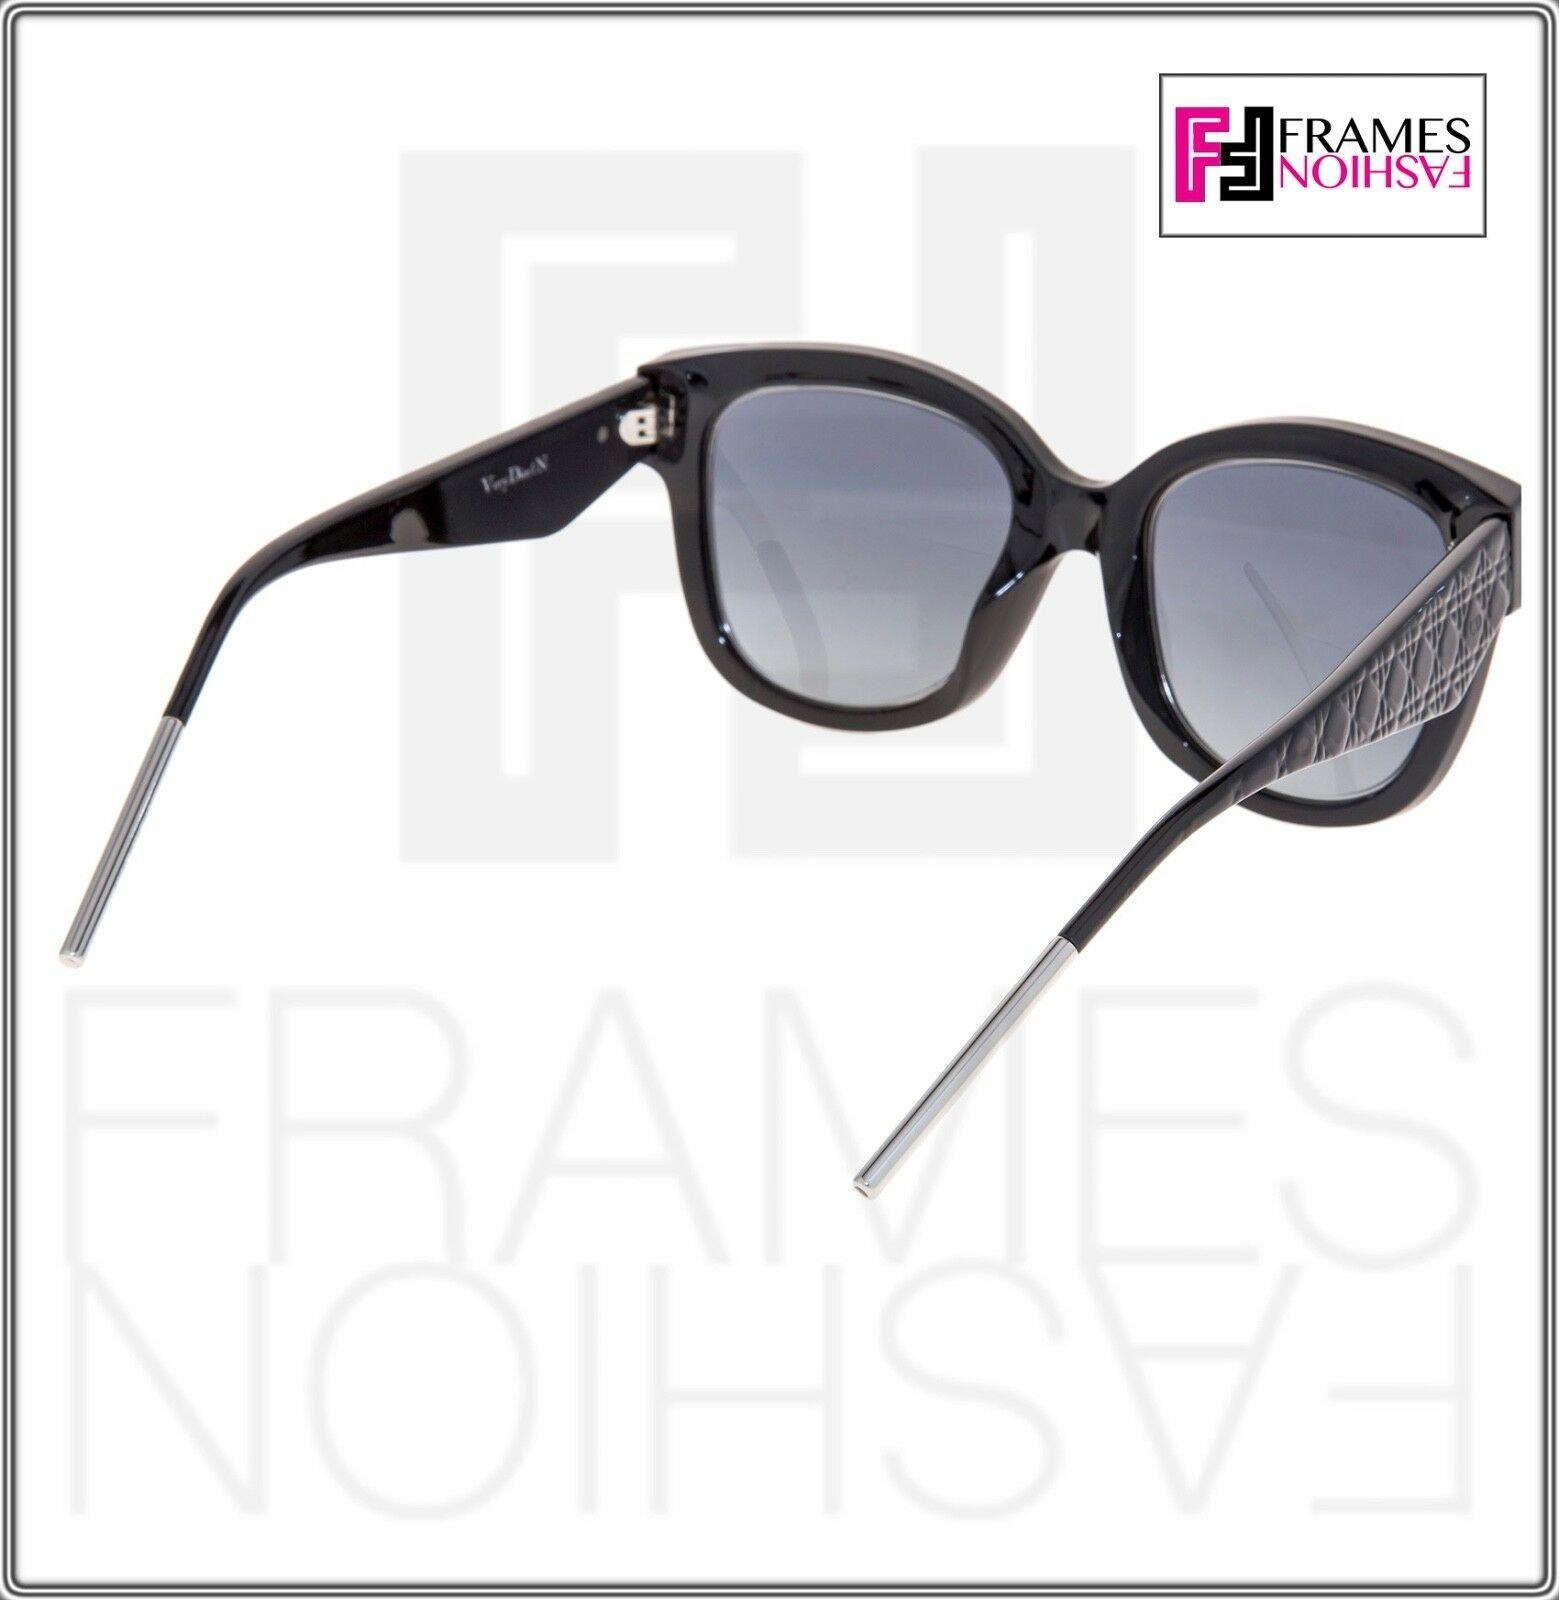 CHRISTIAN DIOR VeryDior 1N Shiny Black SIlver Gradient Square Sunglasses Dior1N